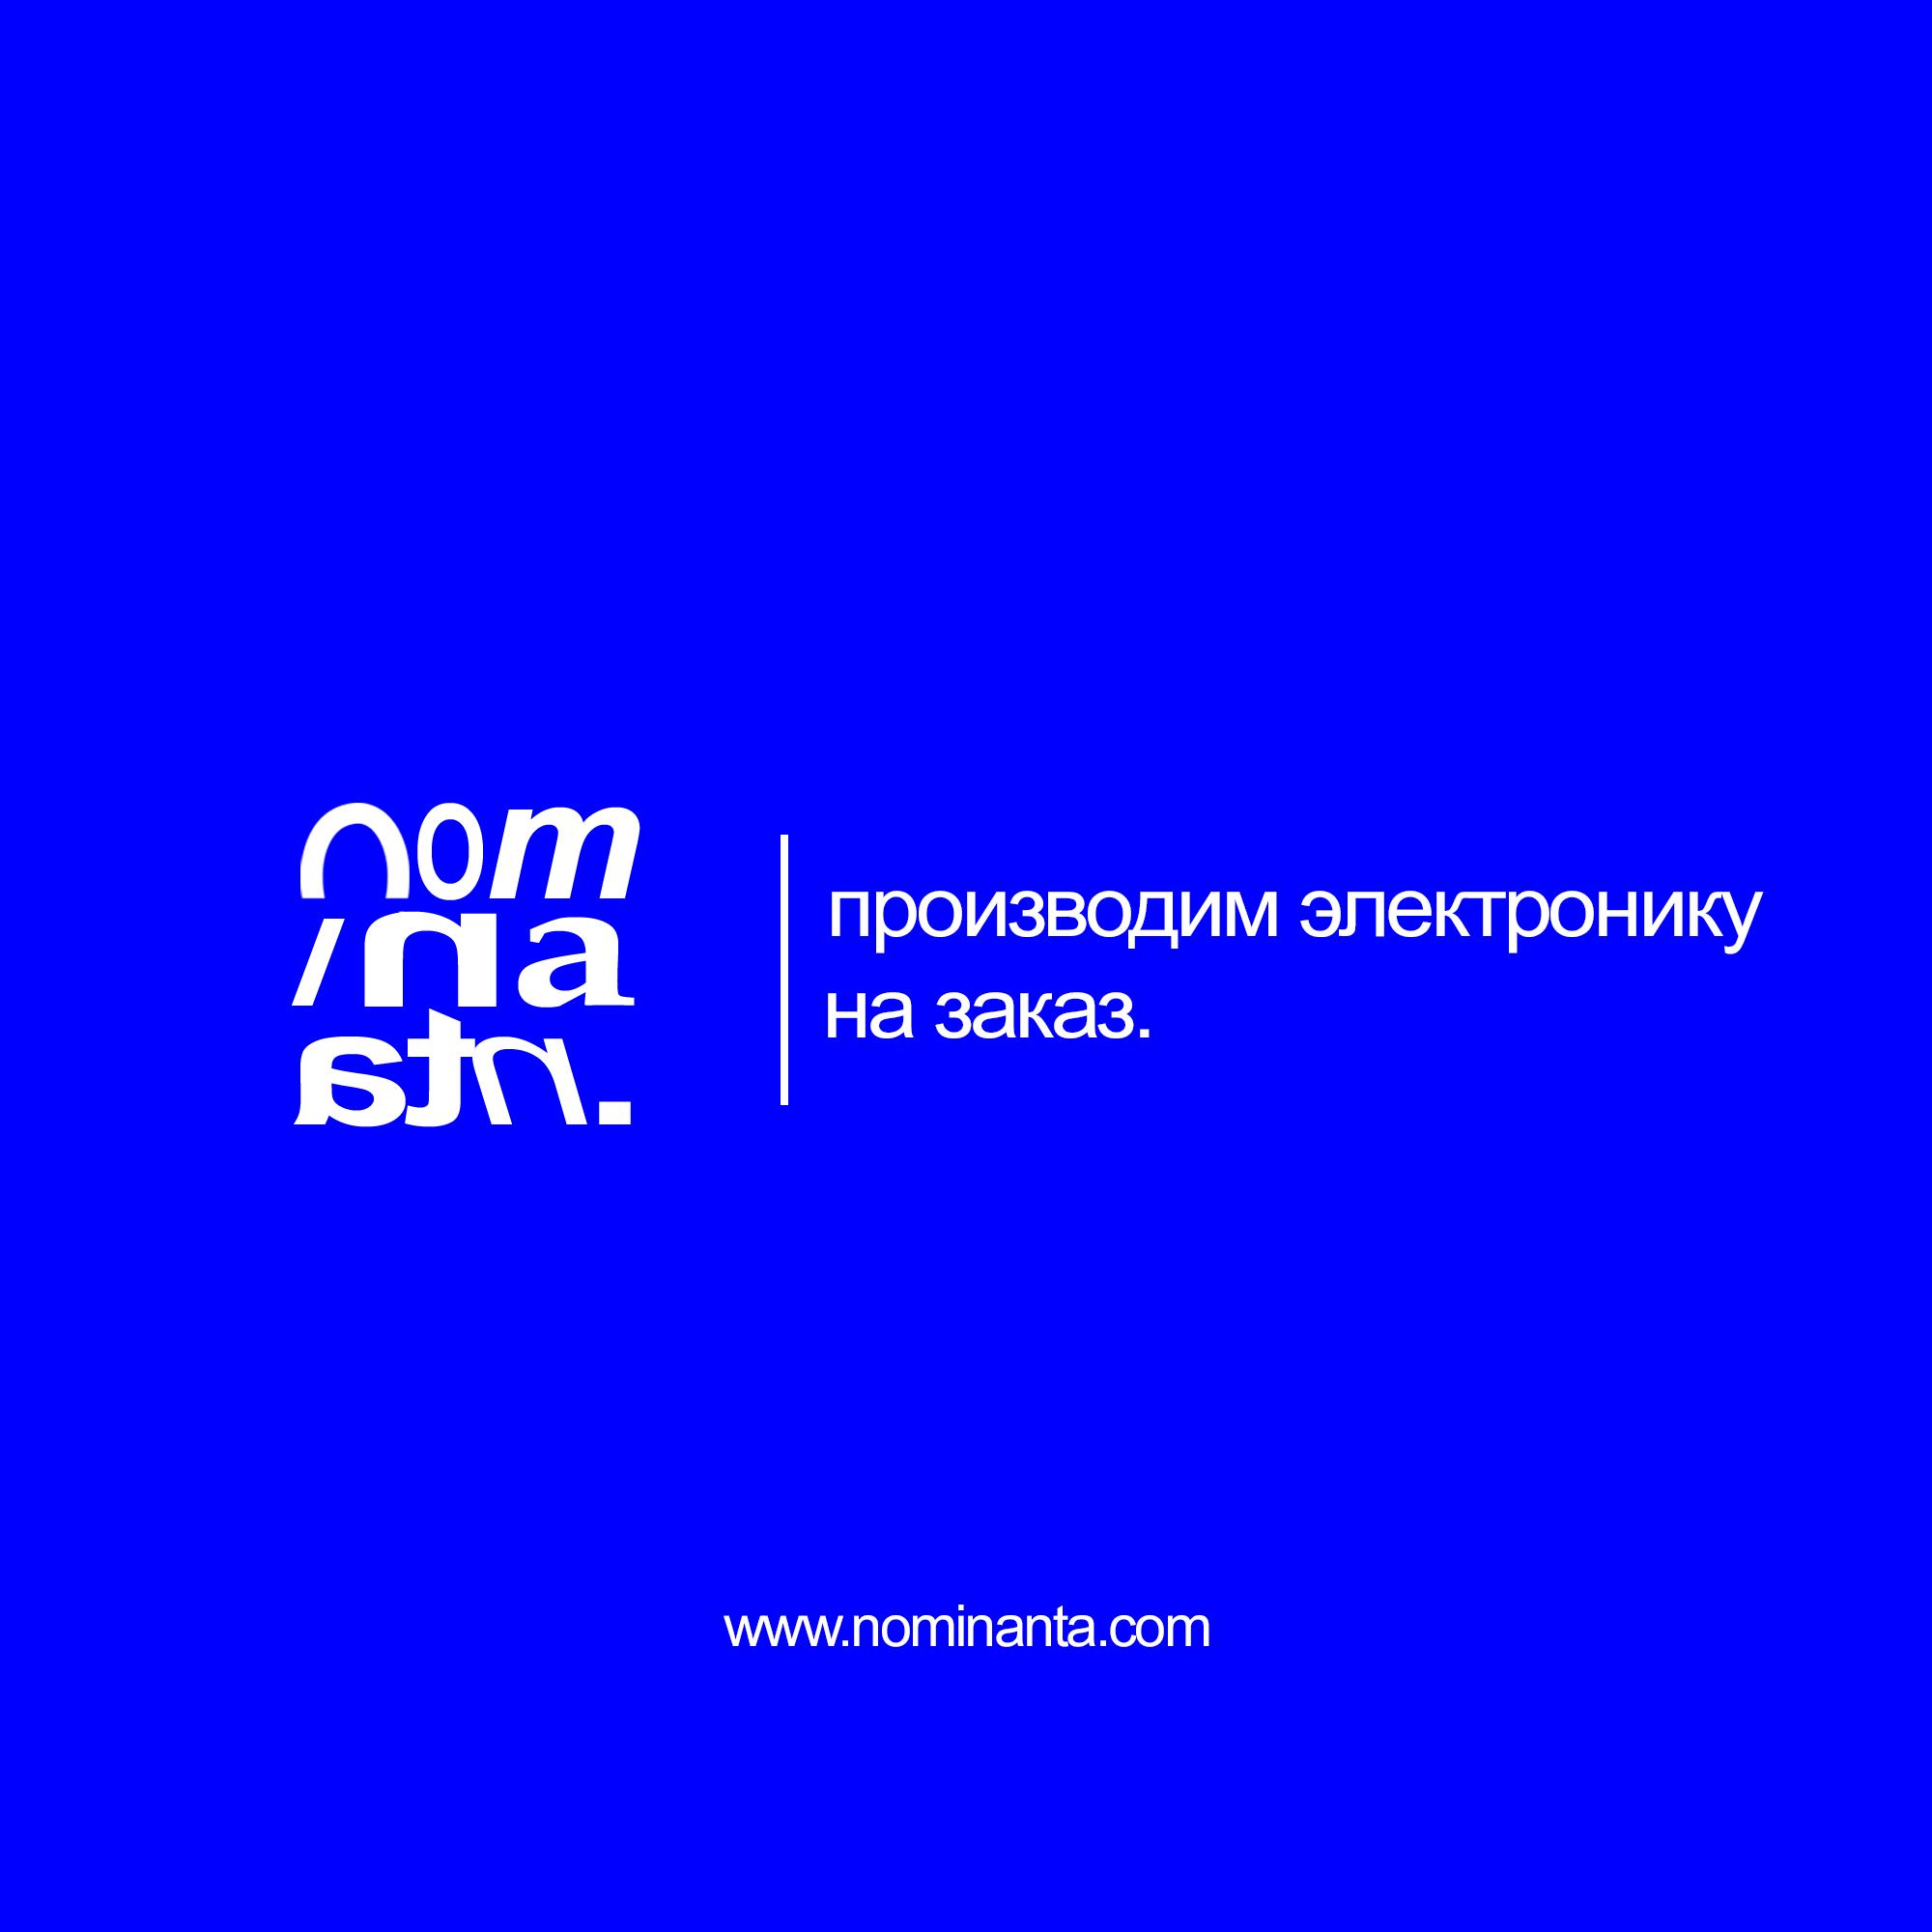 Разработать логотип для КБ по разработке электроники фото f_1115e3eddd59c965.png